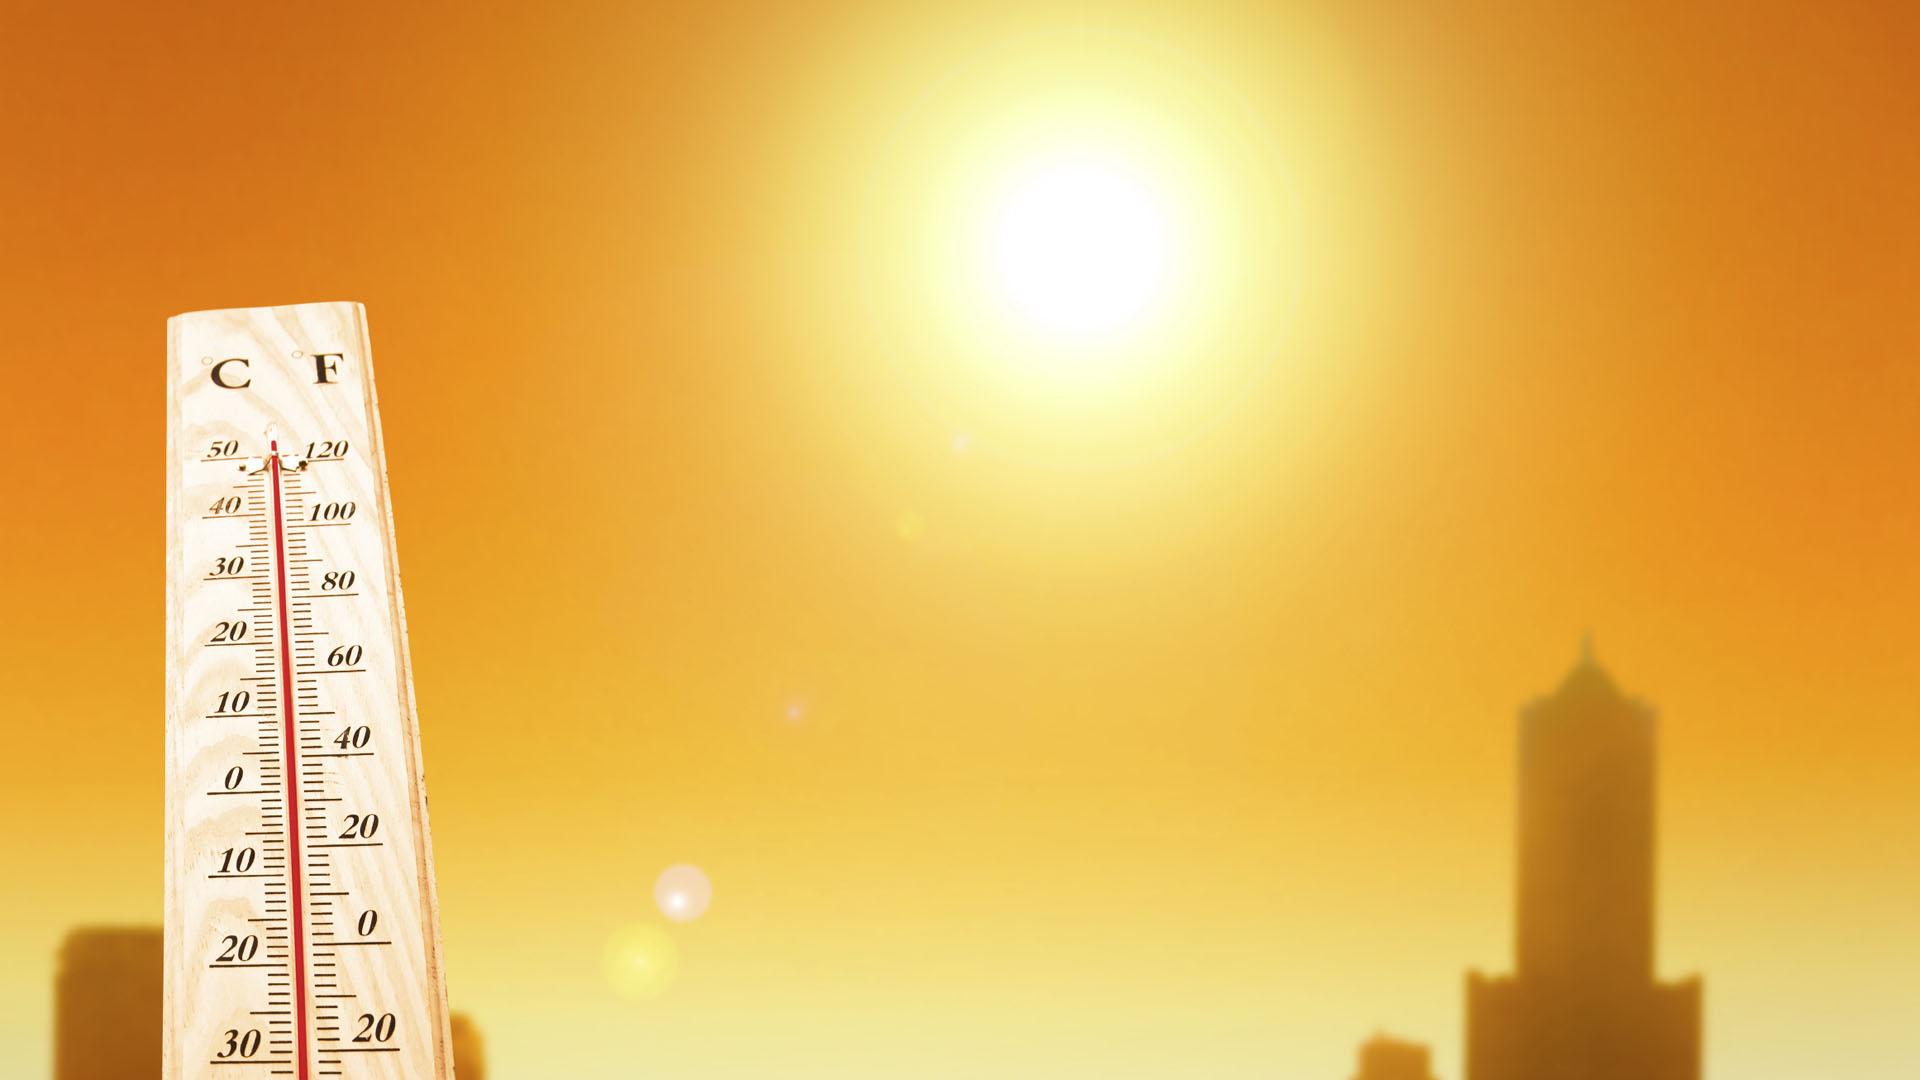 La Organización Meteorológica Mundial estima un alza de 0,3 grados centígrados a final de siglo